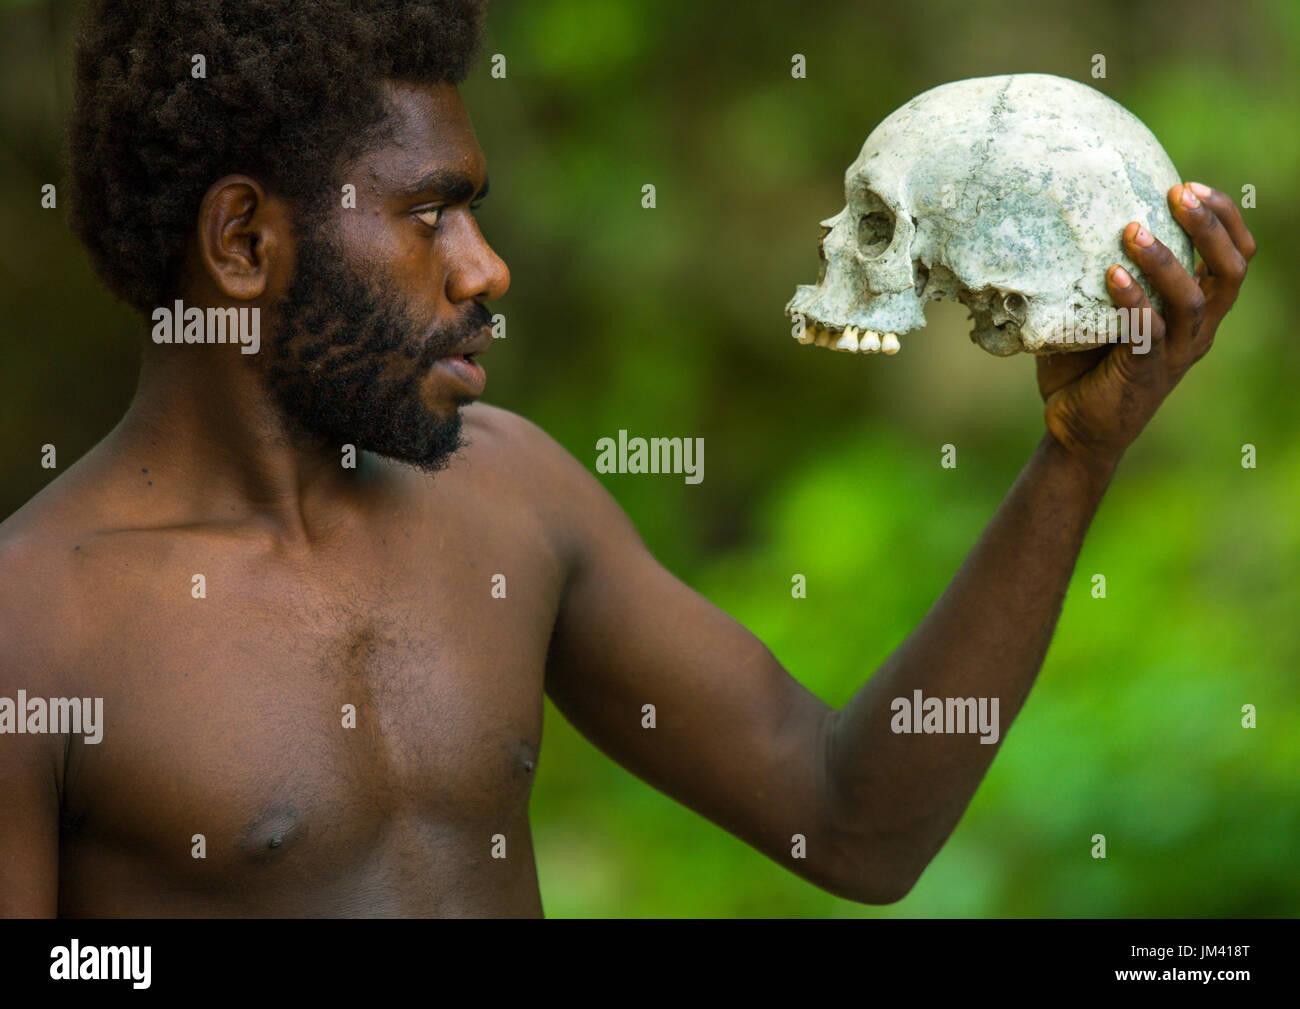 Man holding a human skull in Amelbati cannibal site, Malampa Province, Malekula Island, Vanuatu - Stock Image